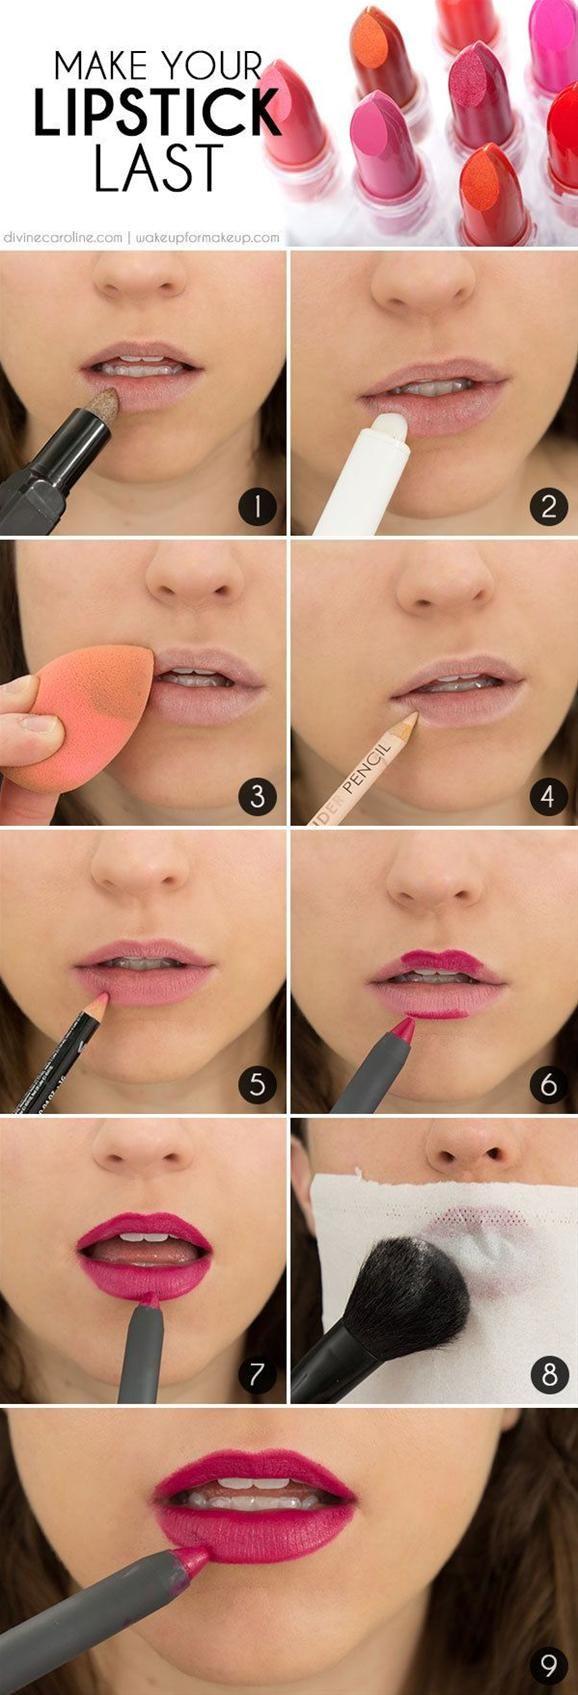 #S4L #beauty4life #makeup www.spice4life.co.za